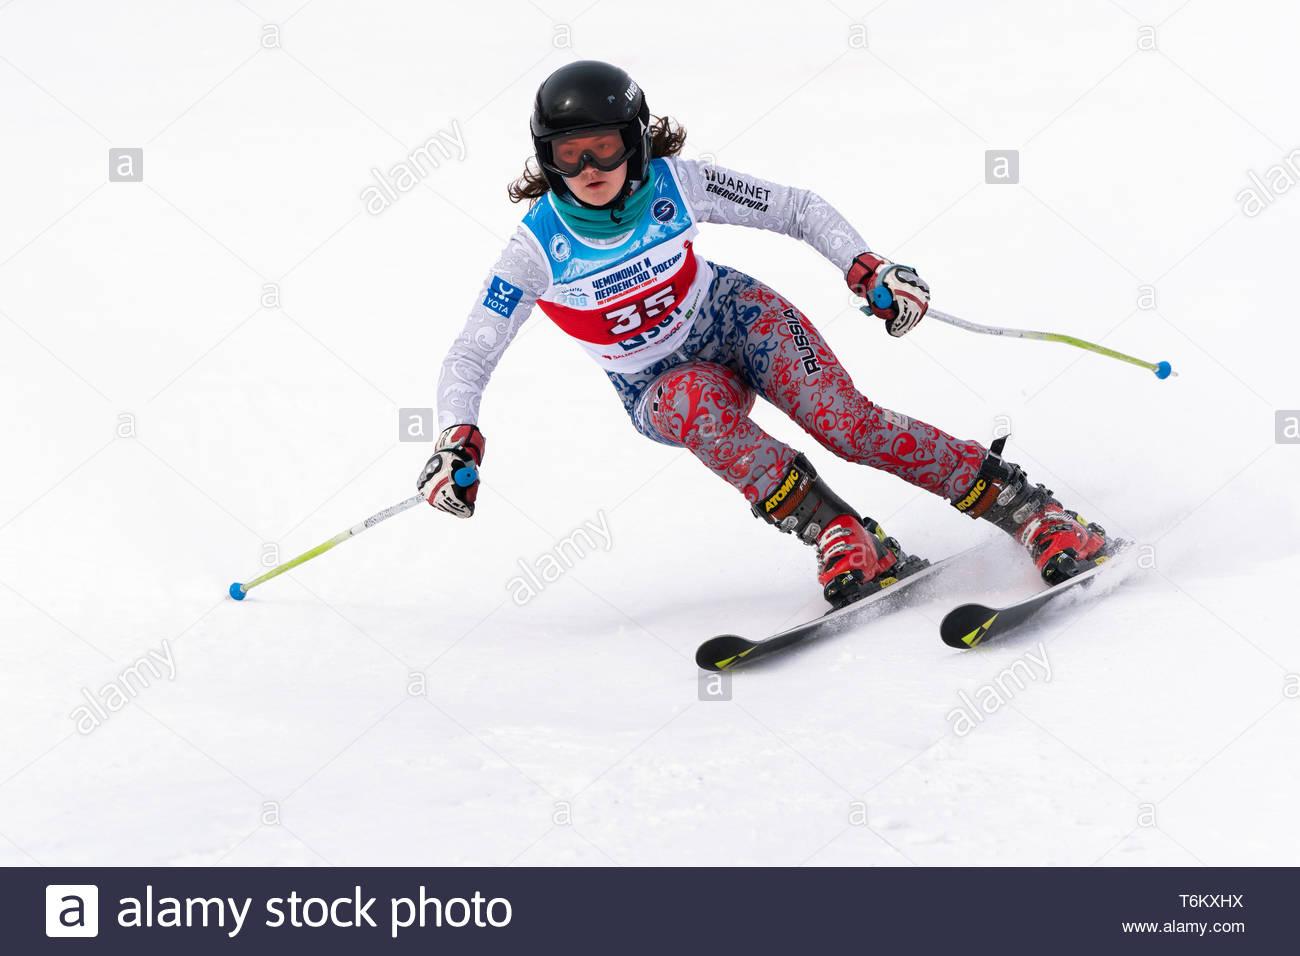 KAMCHATKA PENINSULA, RUSSIA - APR 2, 2019: Mountain skier Polina Delkhman (Krasnoyarsk) skiing down mount. Russian Women's Alpine Skiing Cup, Internat - Stock Image